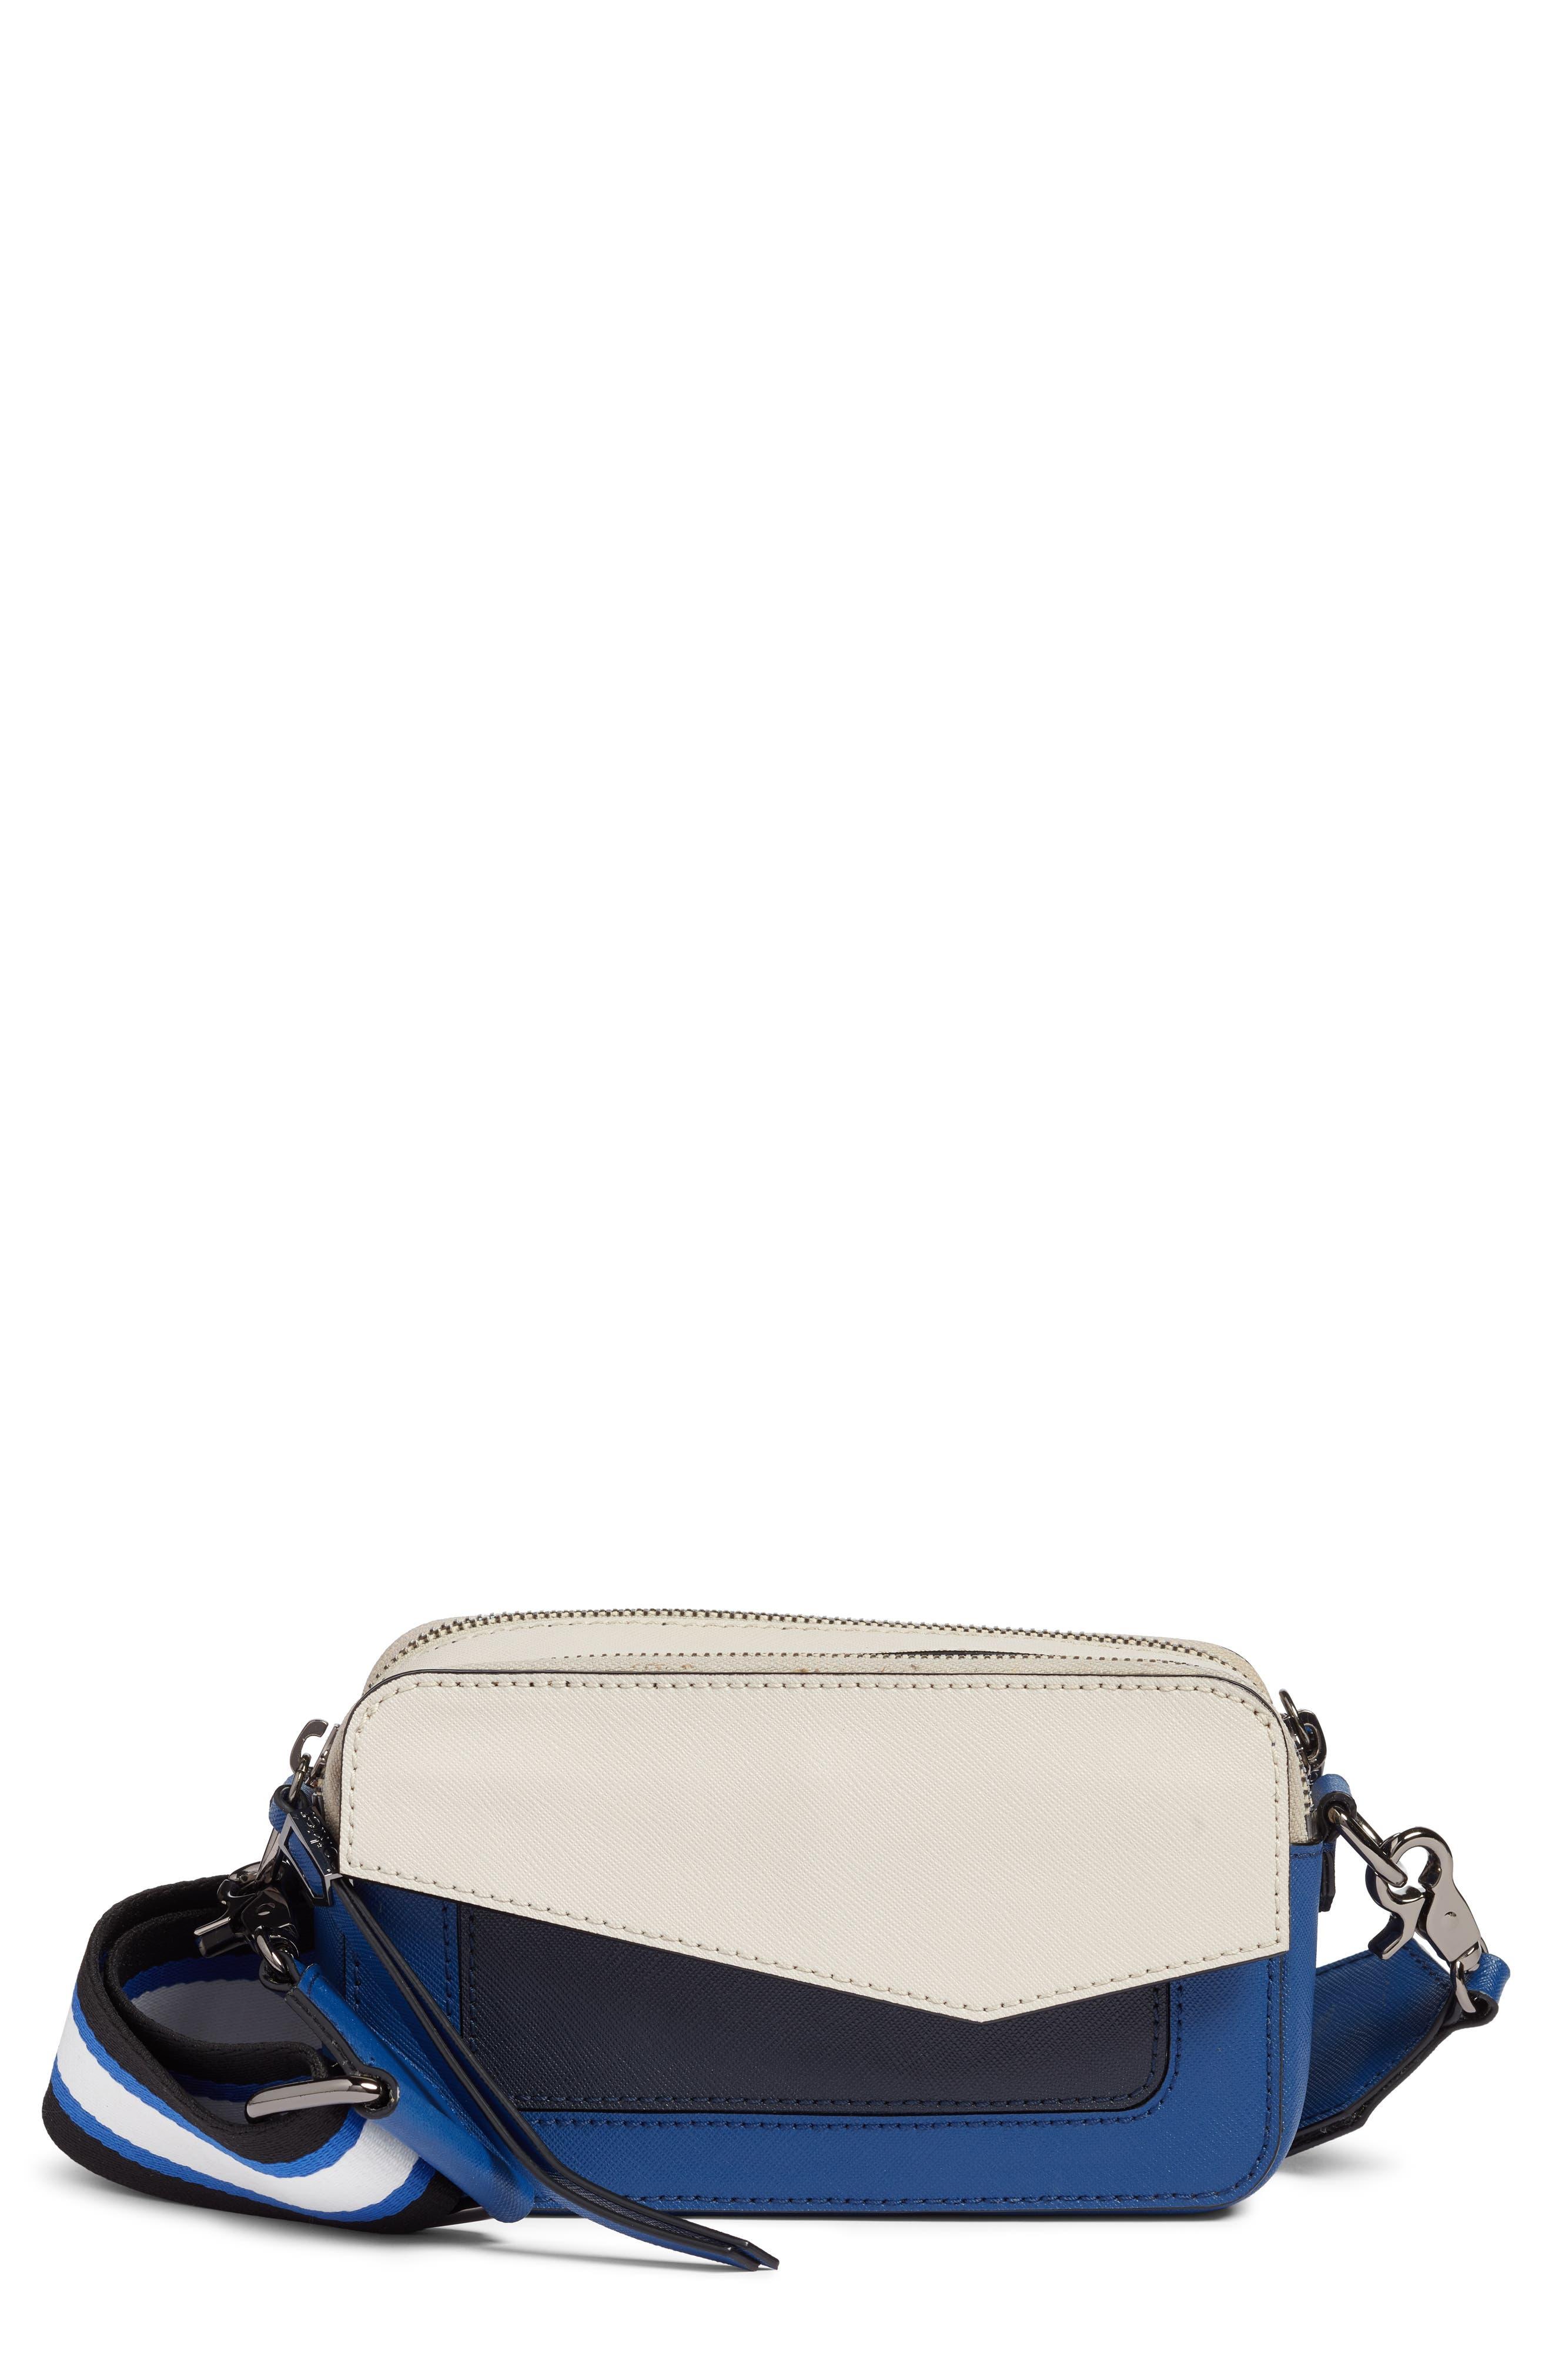 Cobble Hill Mini Crossbody Camera Bag,                         Main,                         color, WINTER BLUE COMBO